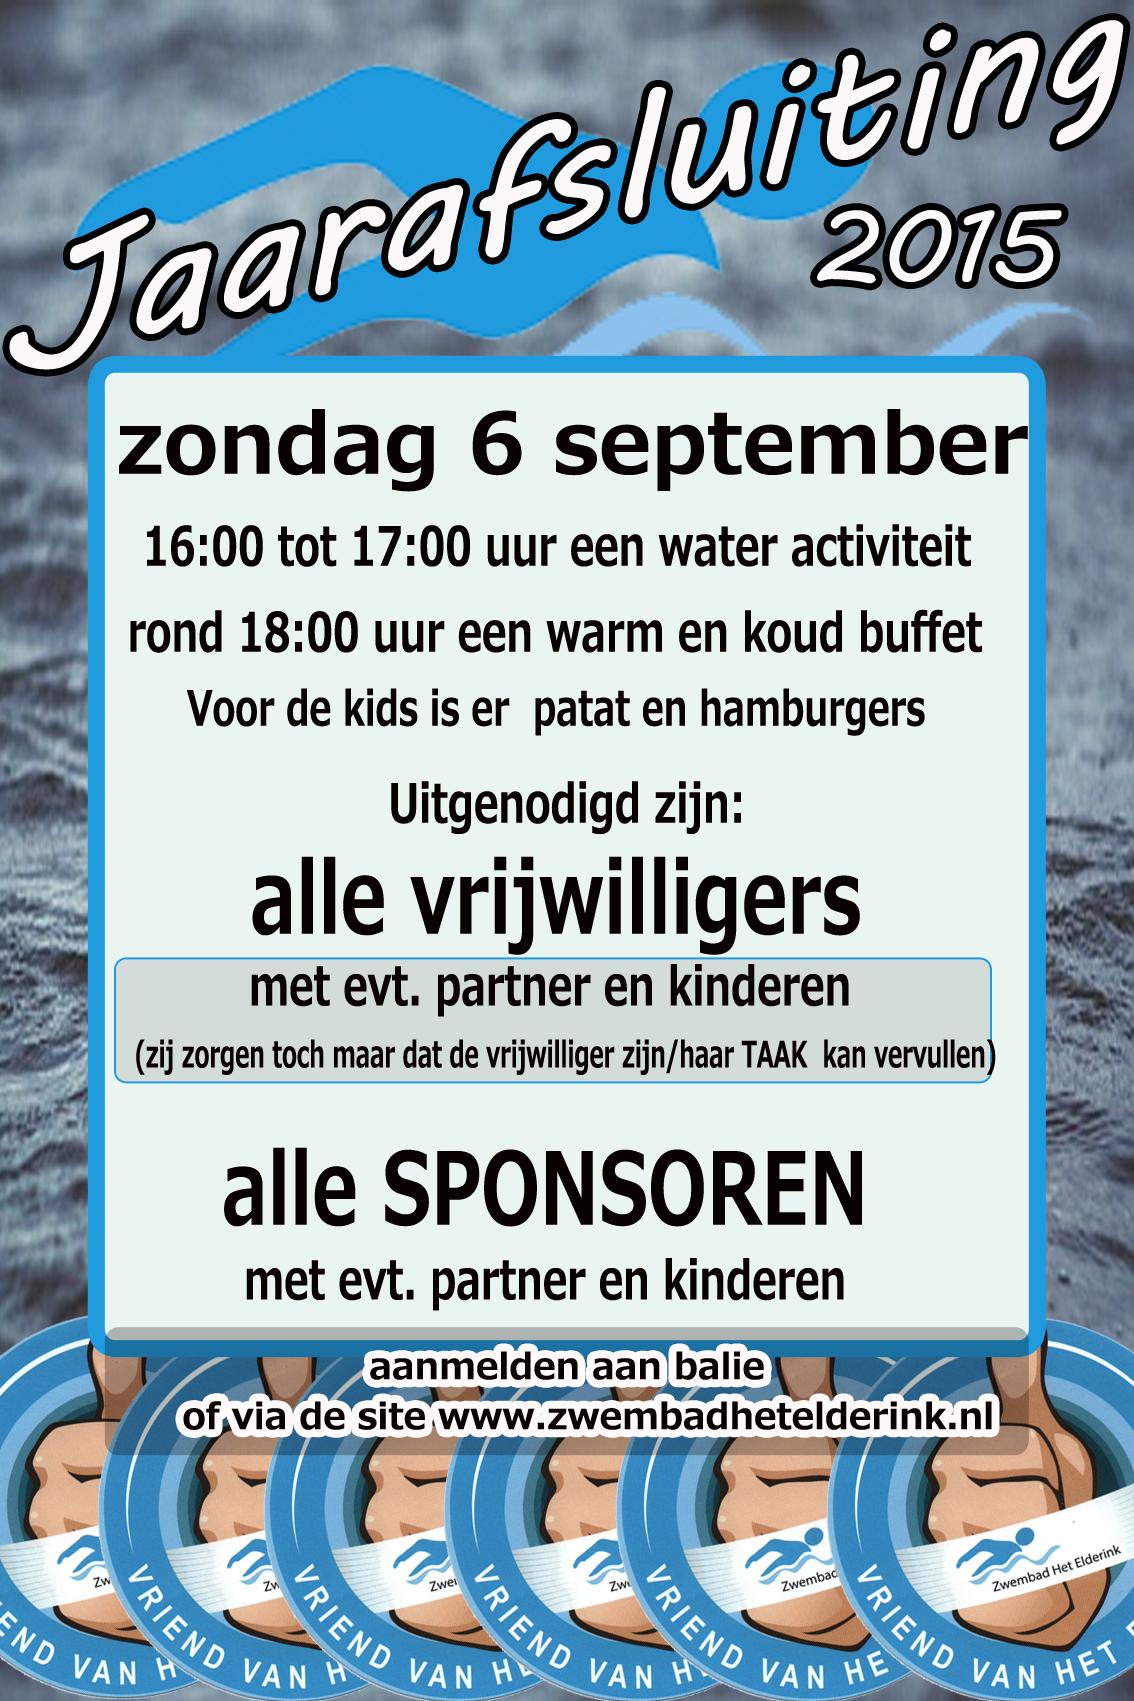 Vrijwilligersfeest zondag 6 september 2015